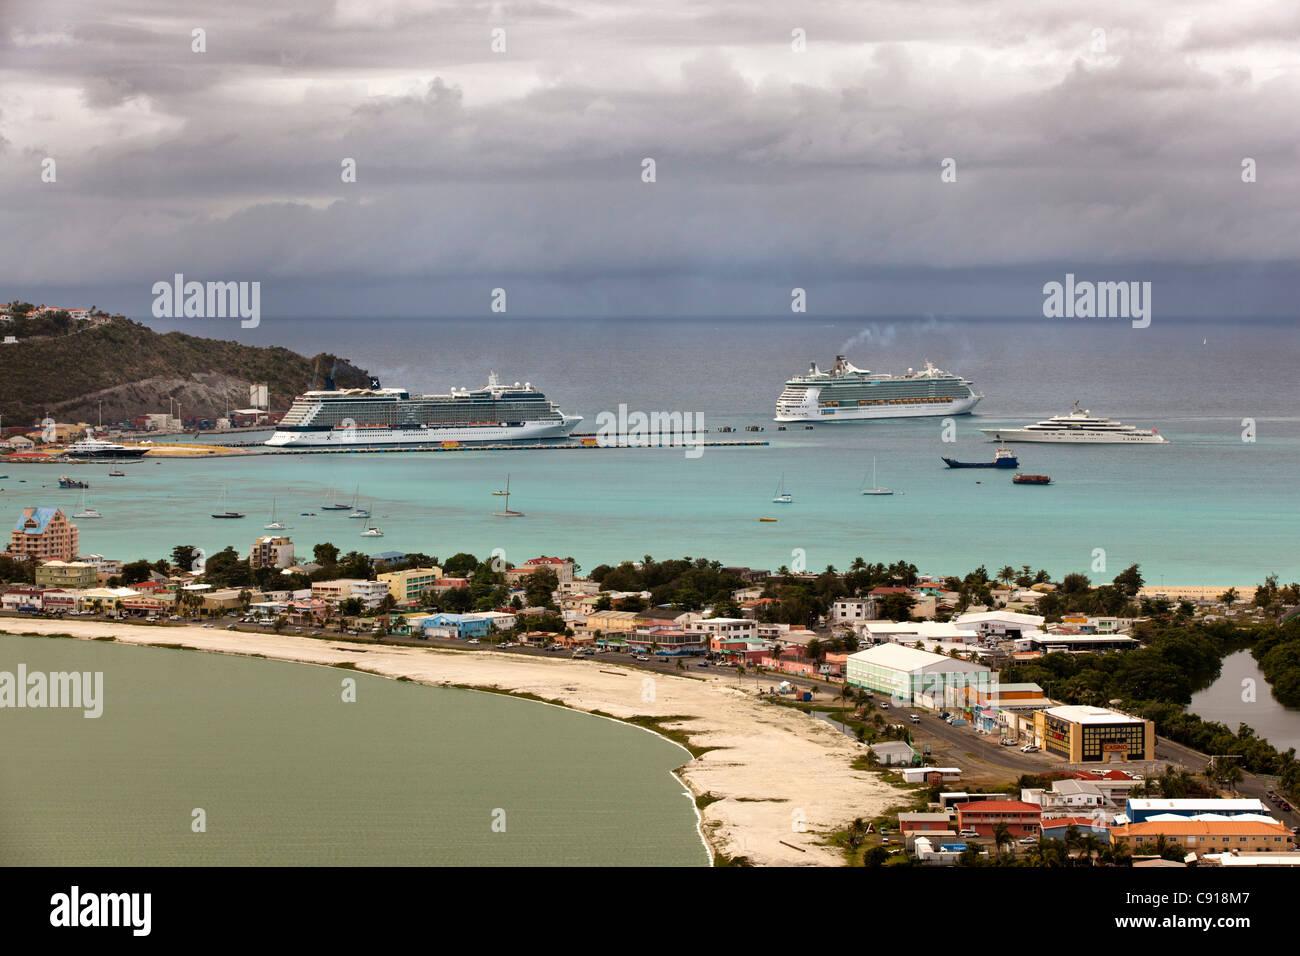 Sint Maarten, Caribbean island, Philipsburg. Cruise ships moored at passengers terminal in Great bay. - Stock Image